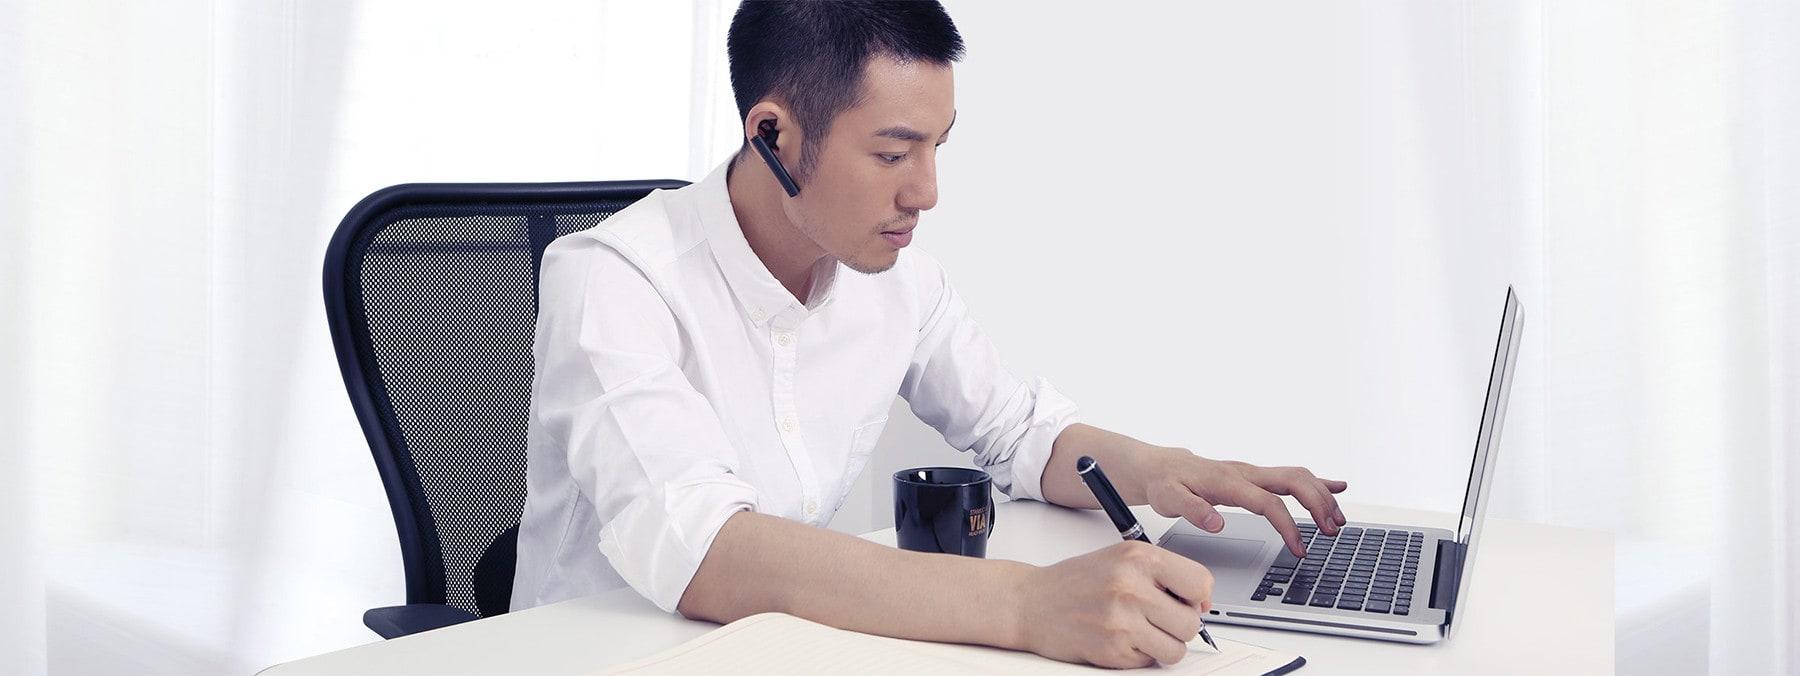 MI Headset 2